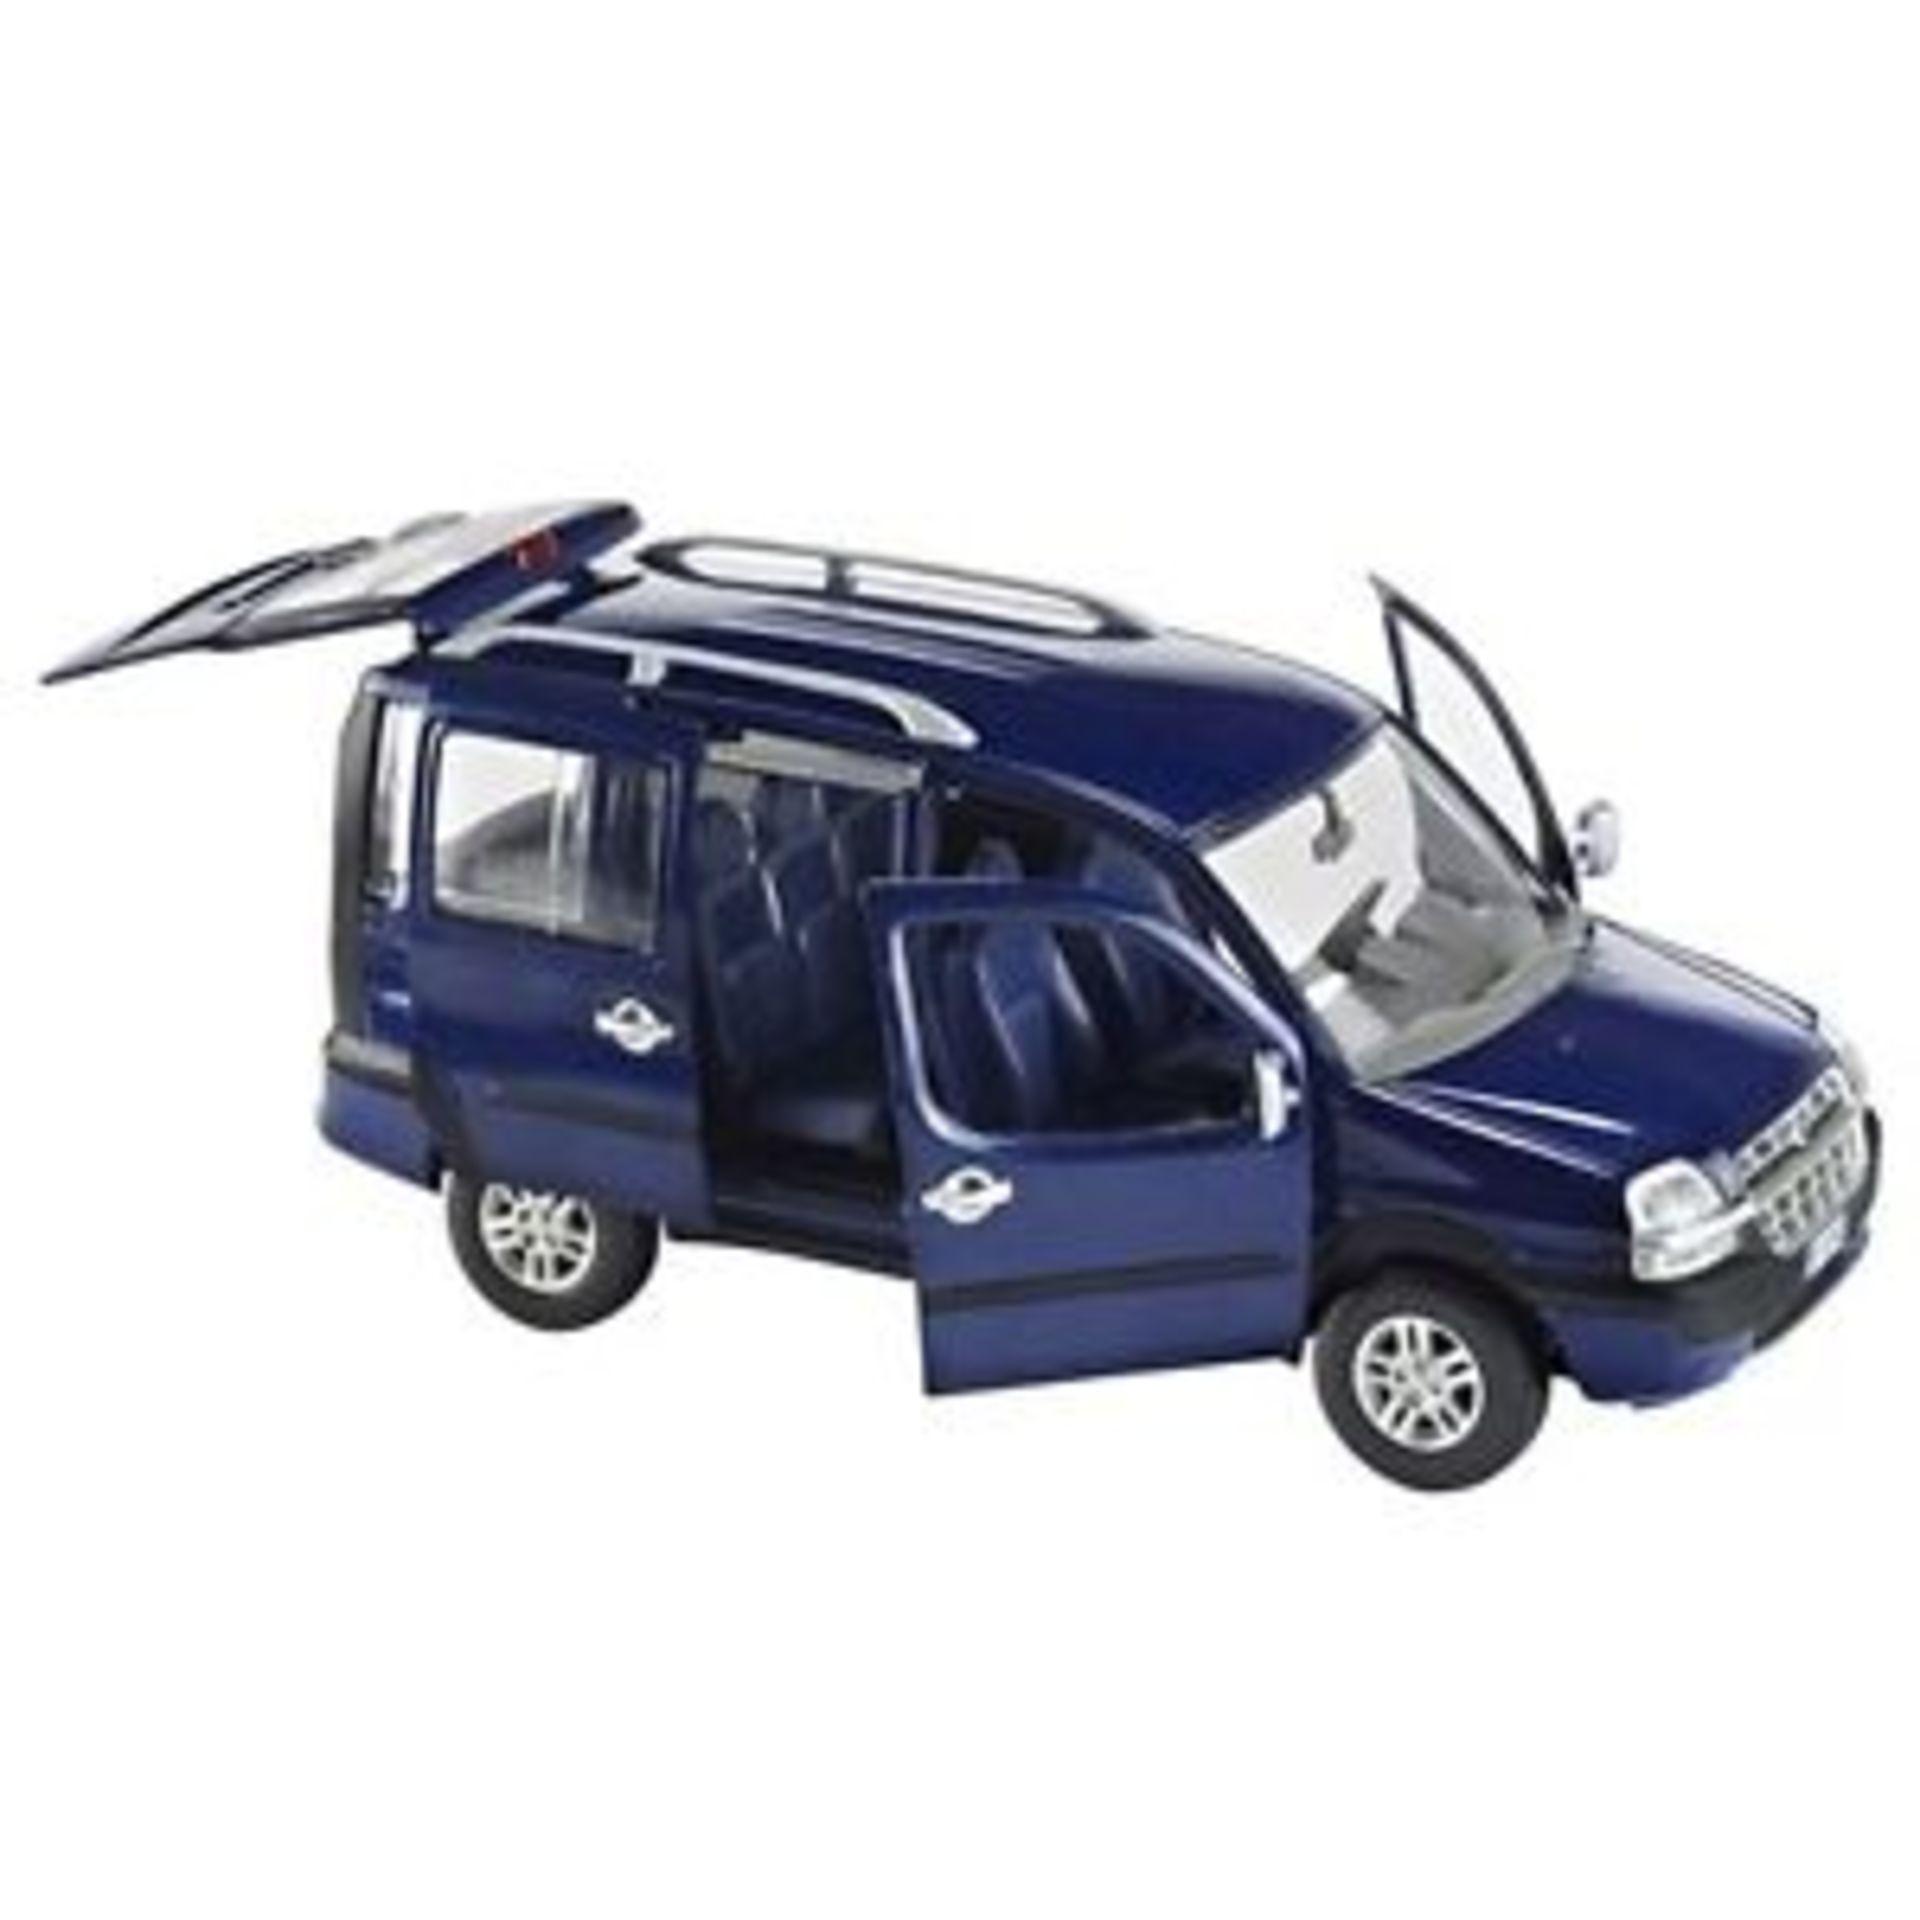 V Brand New 1/24 Die Cast Fiat Doblo Malibu - eBay Price £16.99